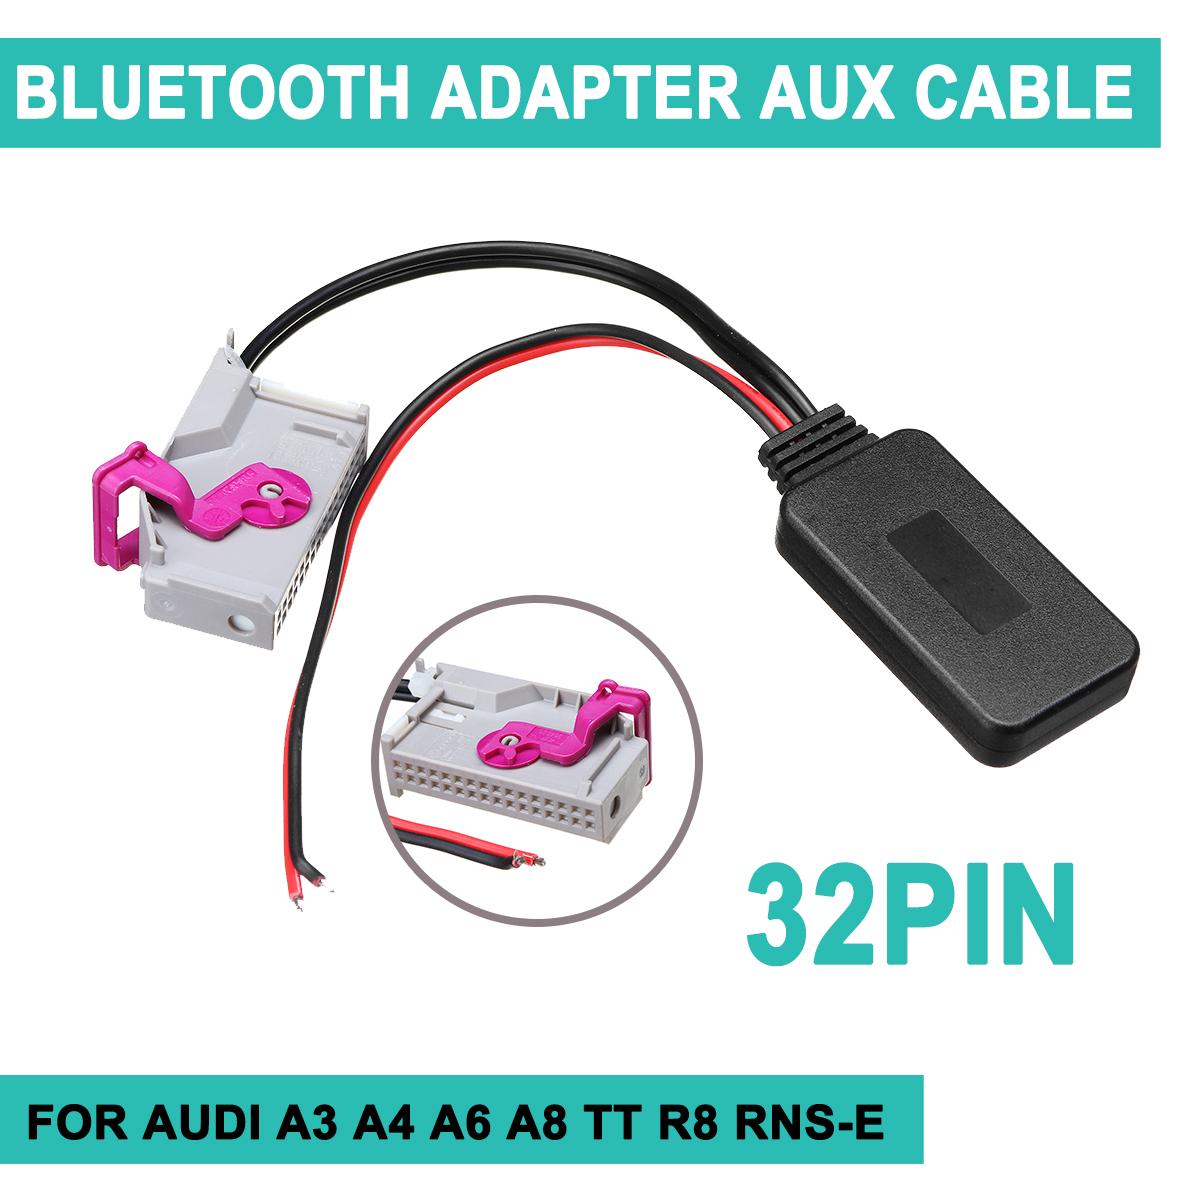 Adattatore Aux Bluetooth Cavo Audio Senza Fili Con Microfono per Audi A3 A4 A6 A8 TT R8 RNS-E 32 PIN